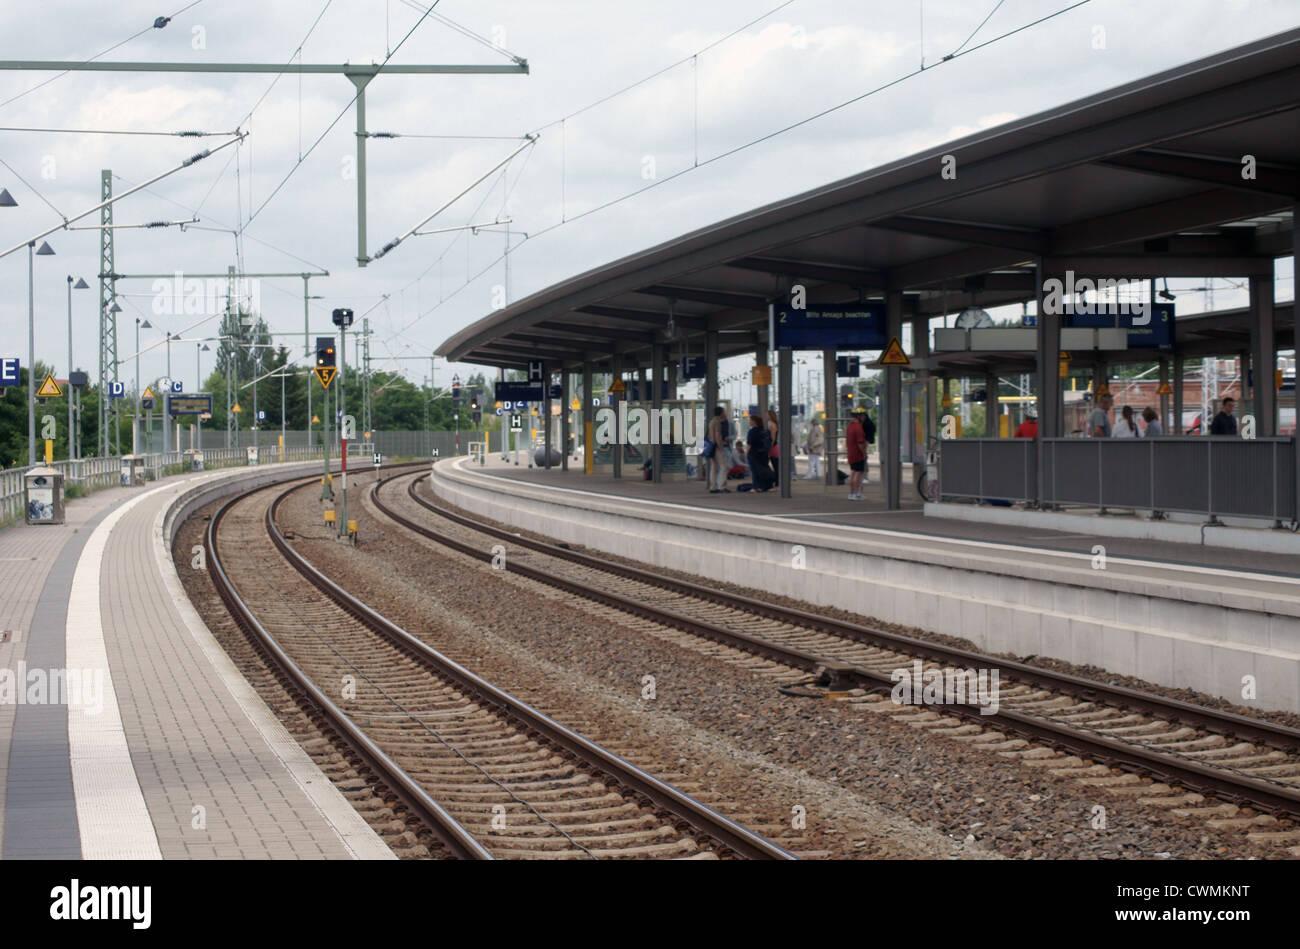 train station - Stock Image